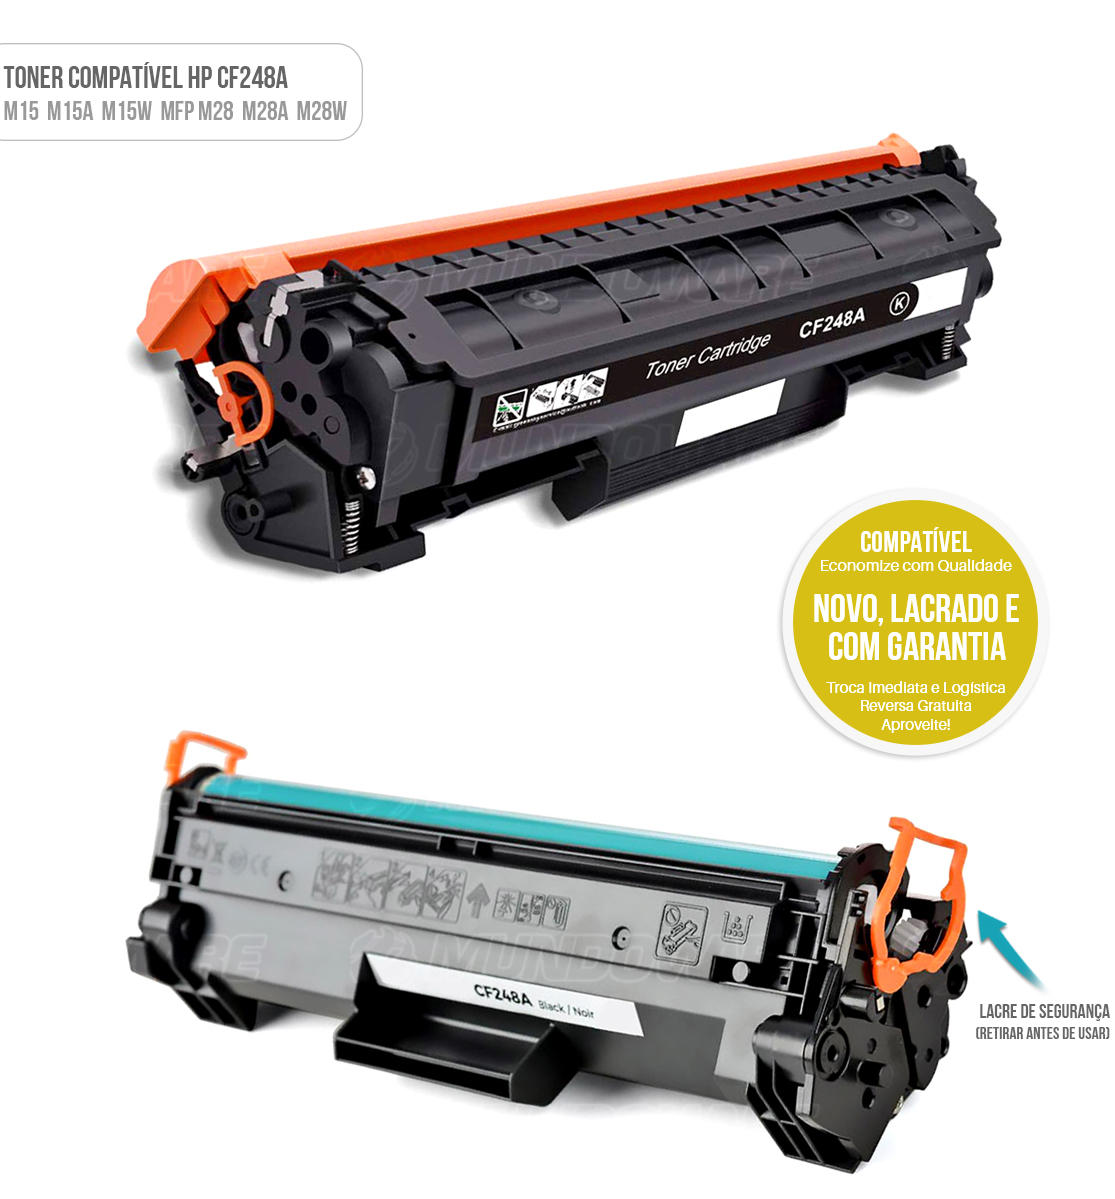 Toner Compatível CF248 248A para Impressora HP M15 M15A M15W MFP M28 M28A M28W Tonner